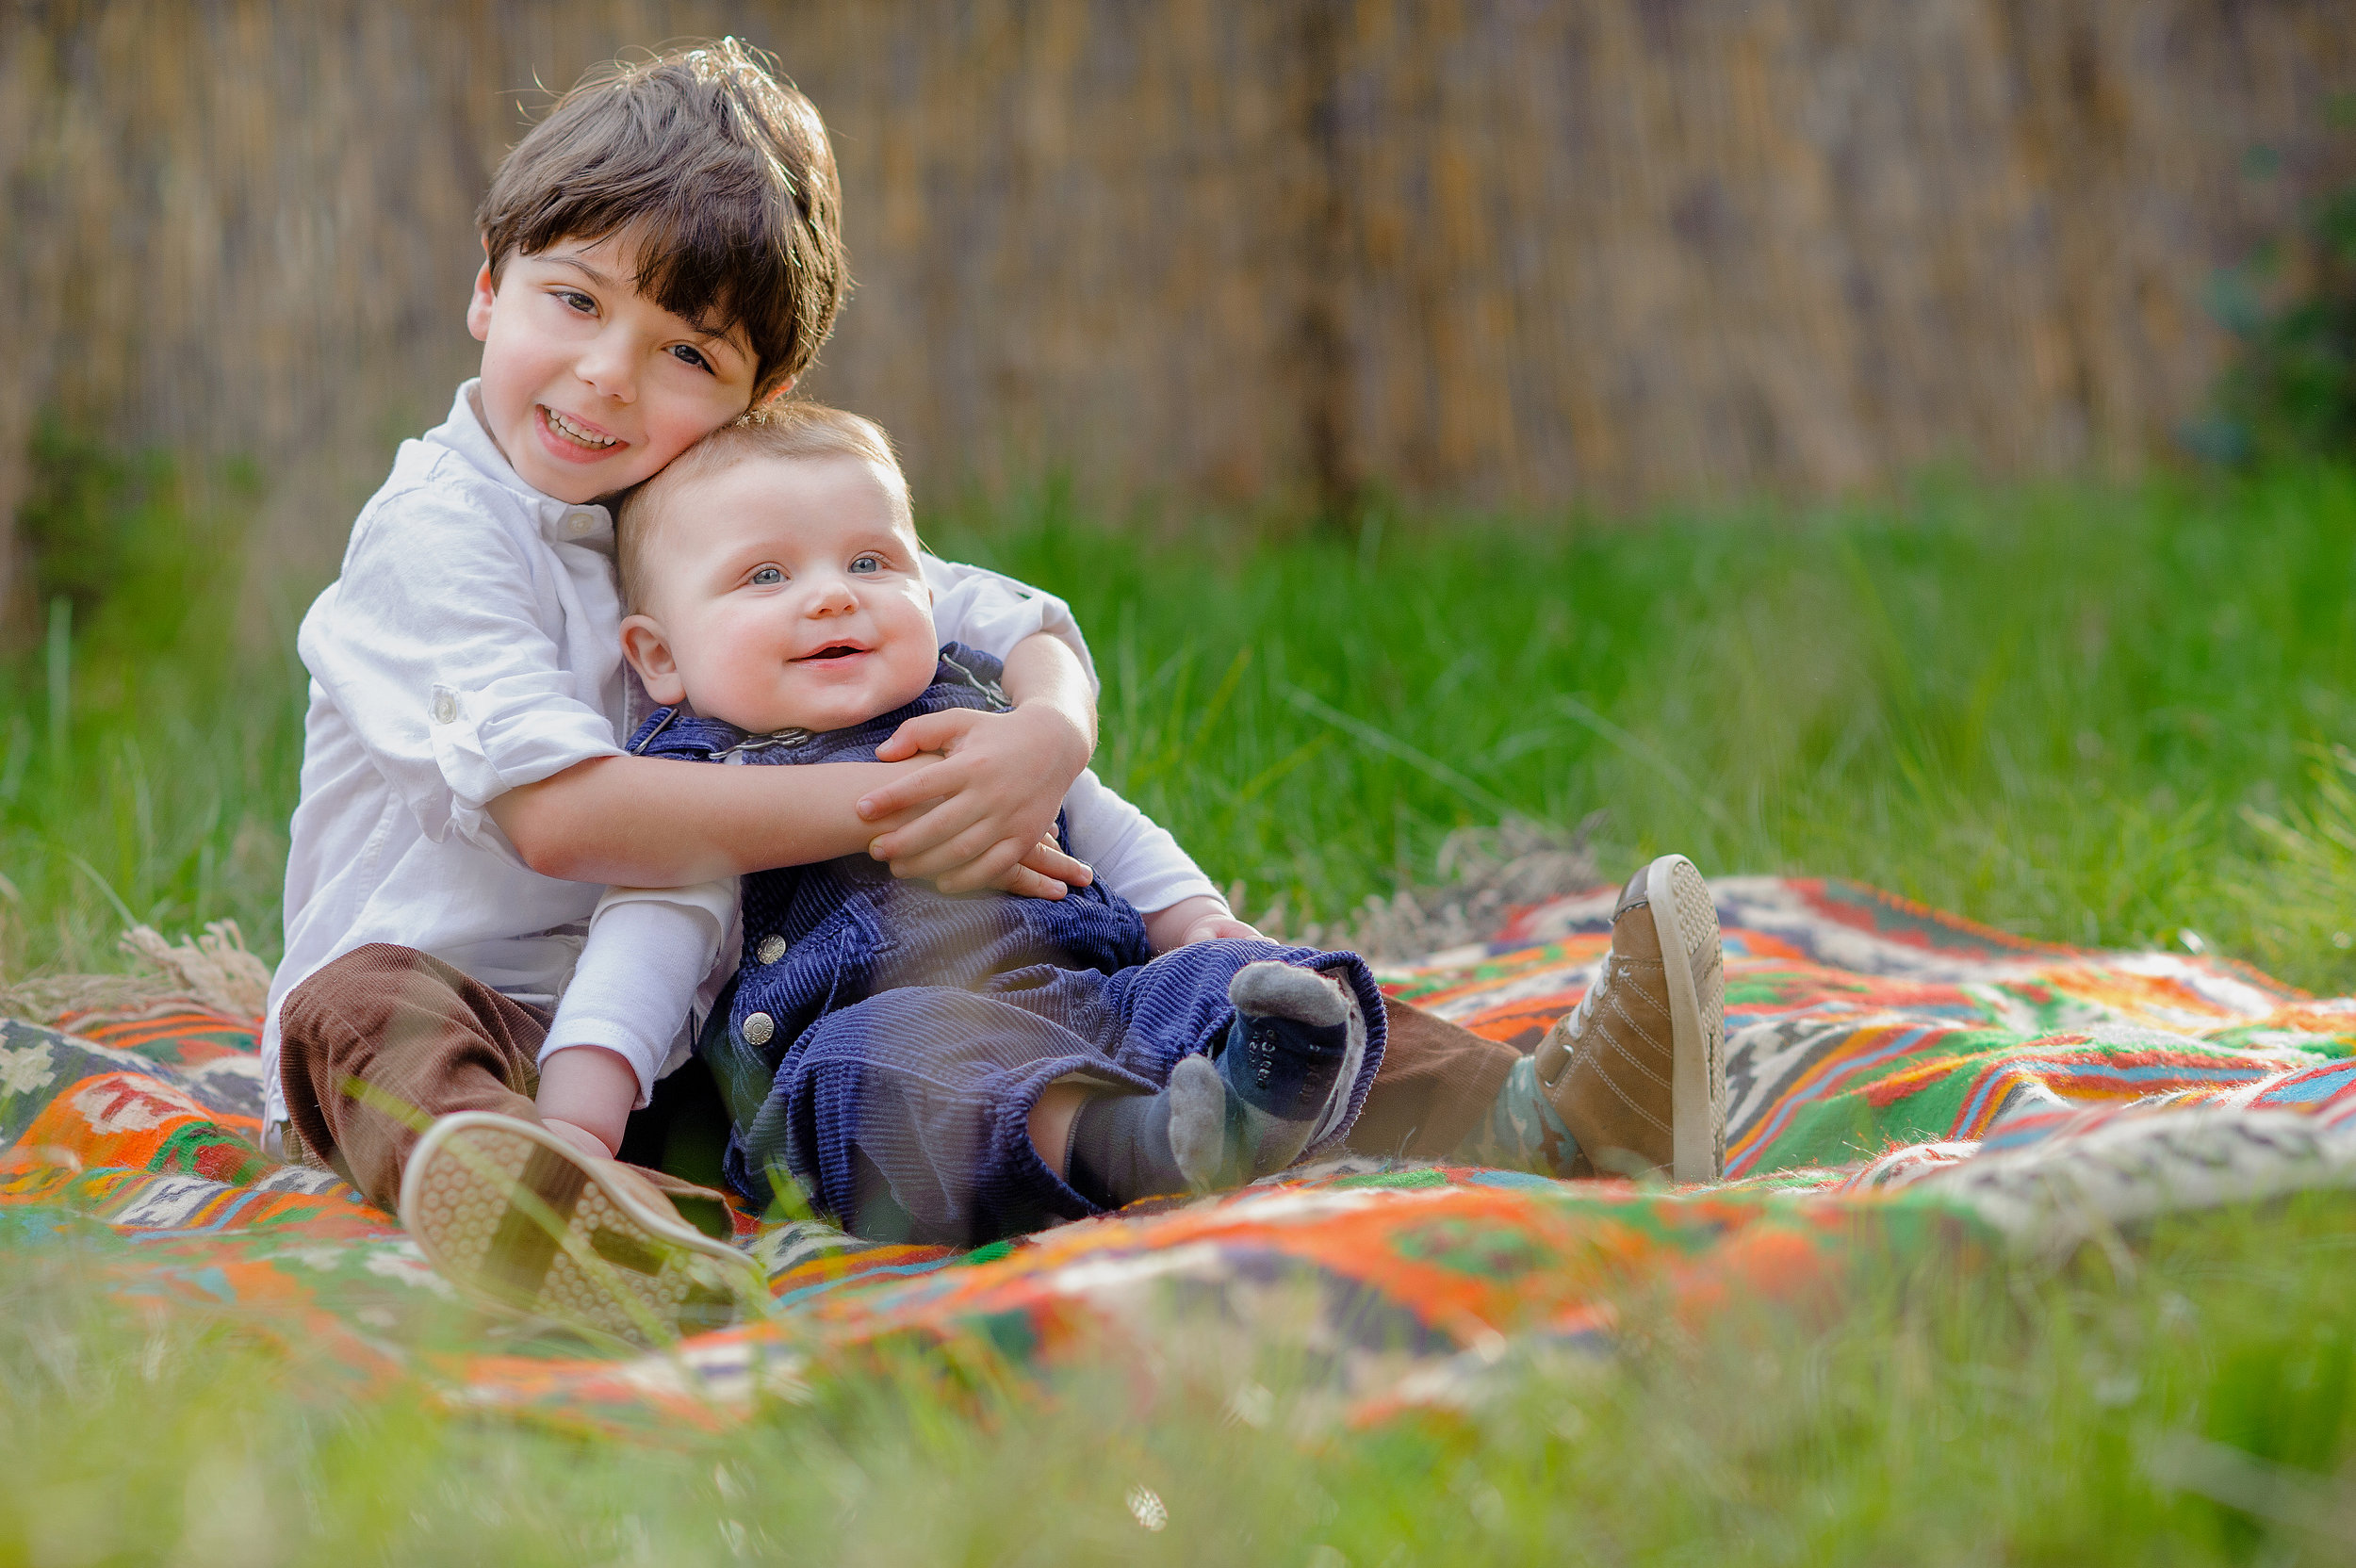 chapman-family-104-sacramento-family-photographer-katherine-nicole-photography.JPG